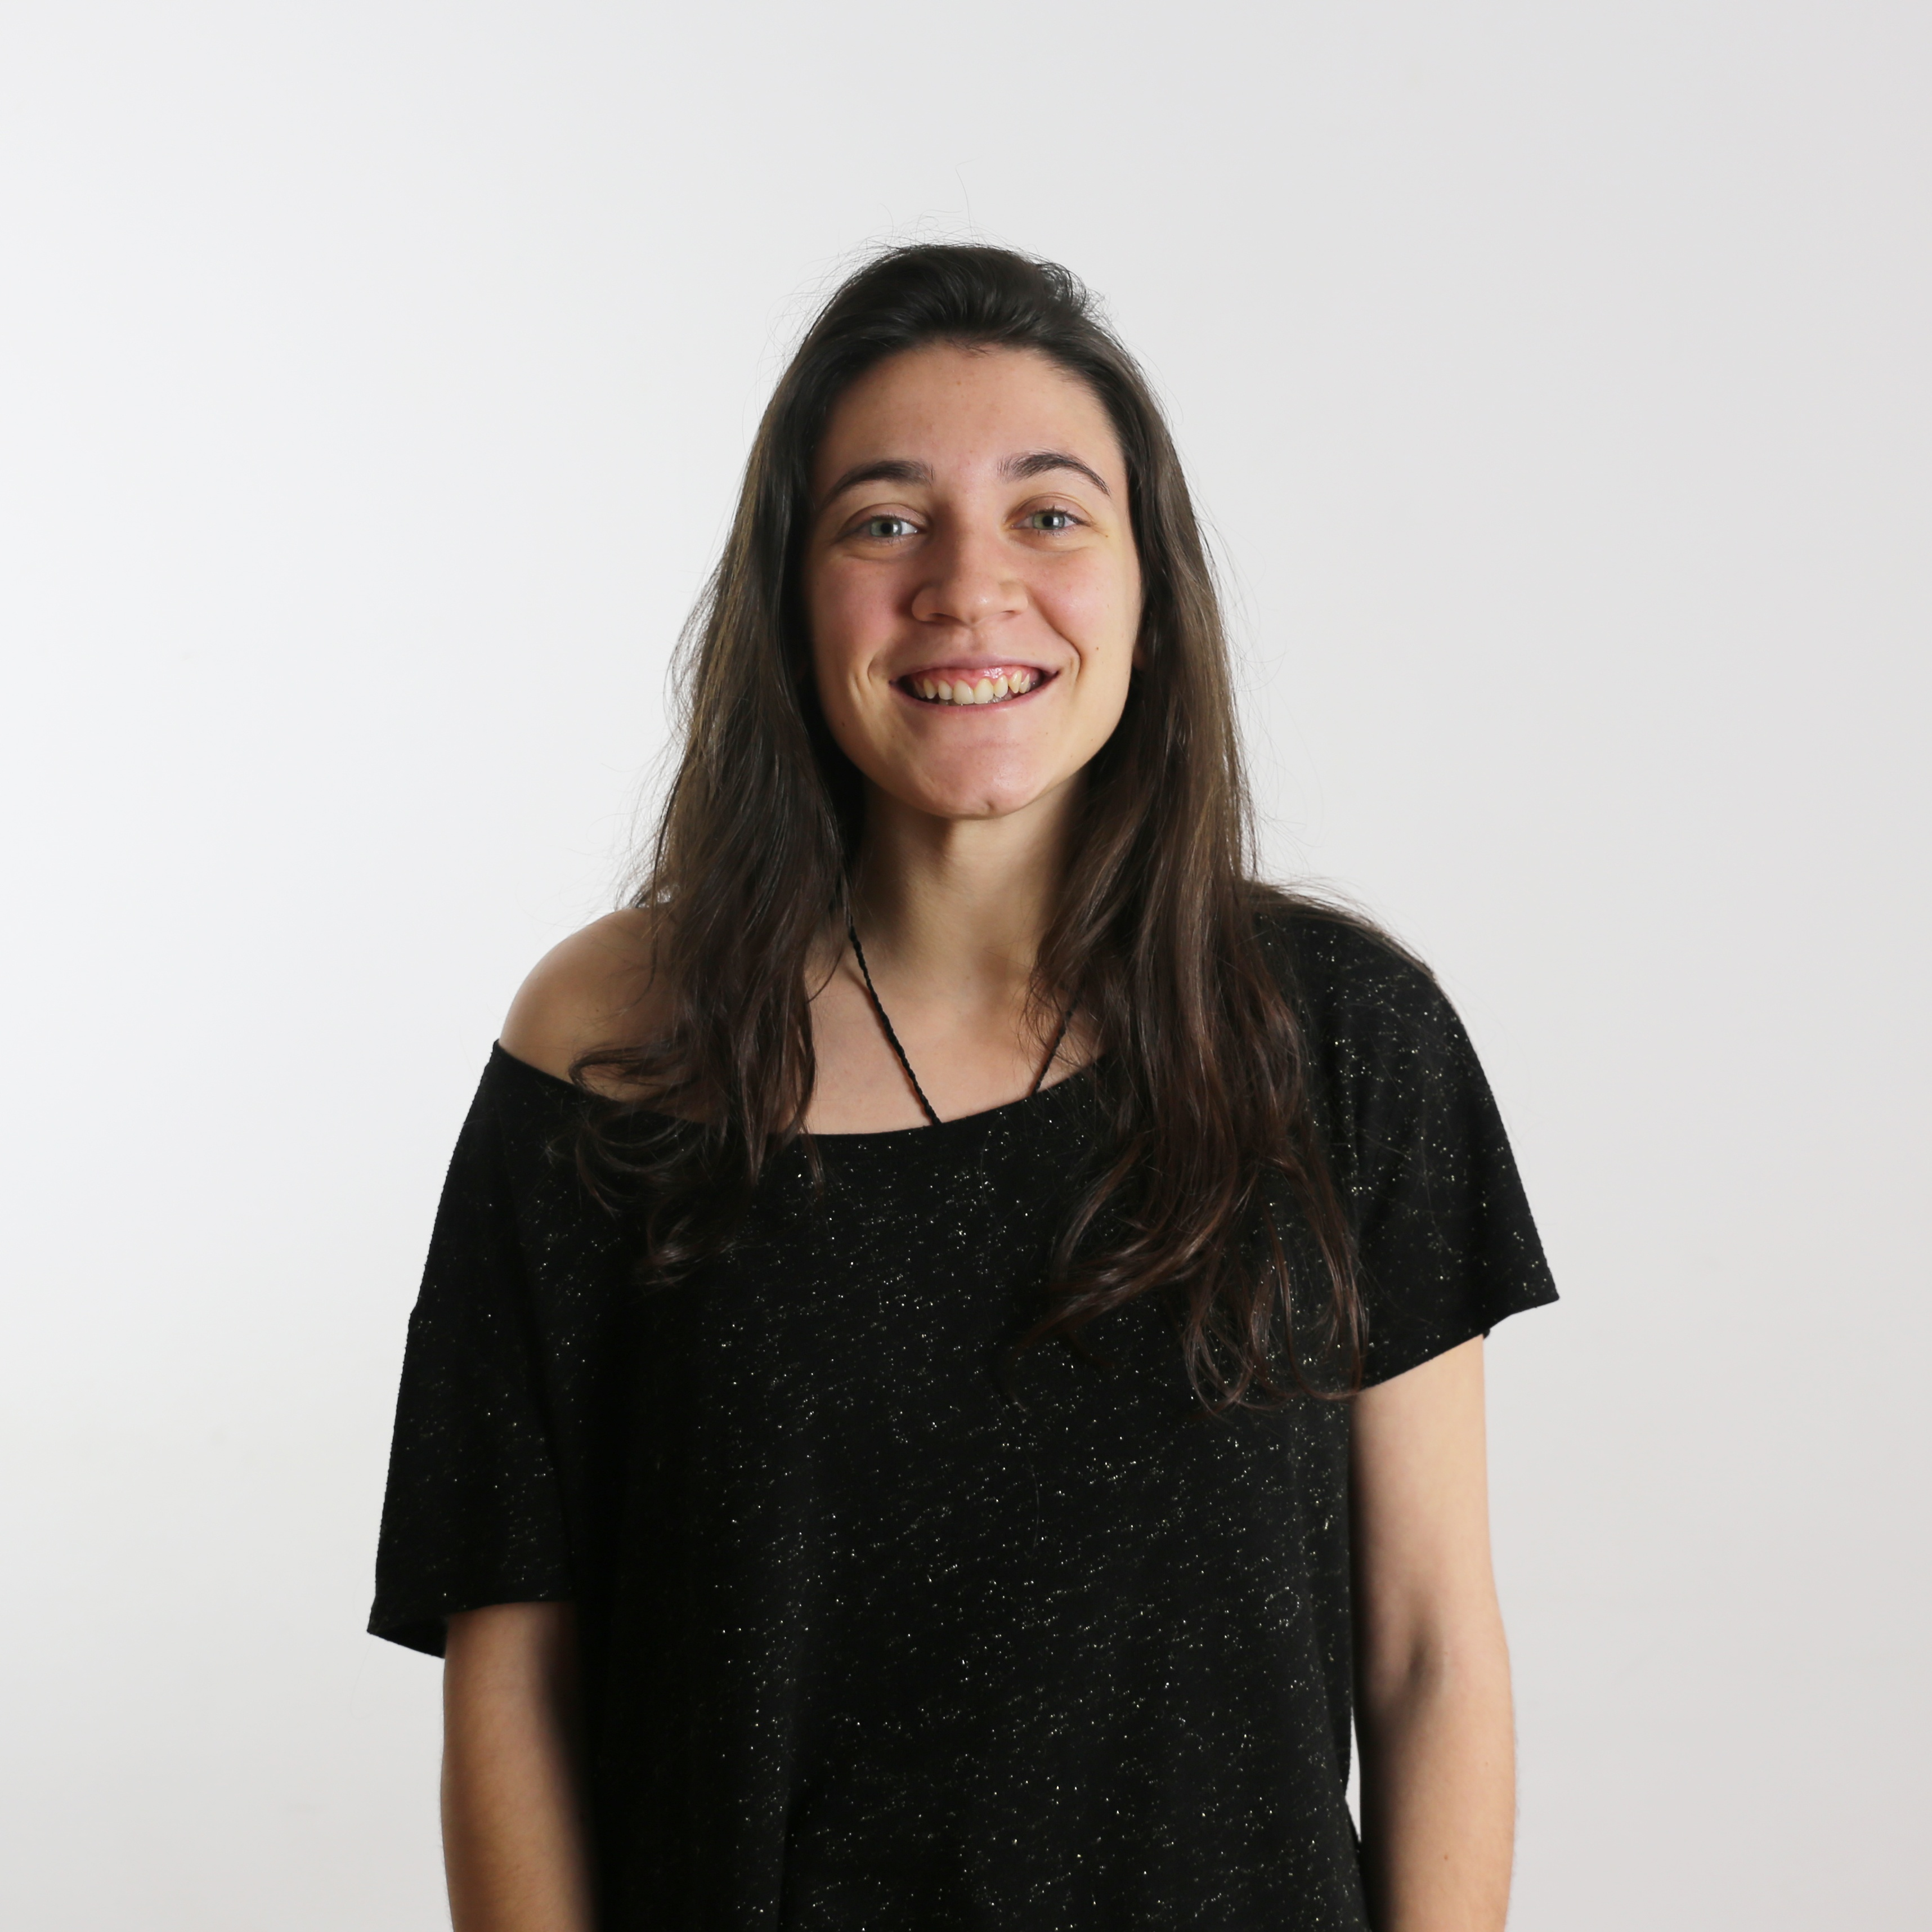 Clàudia Martínez